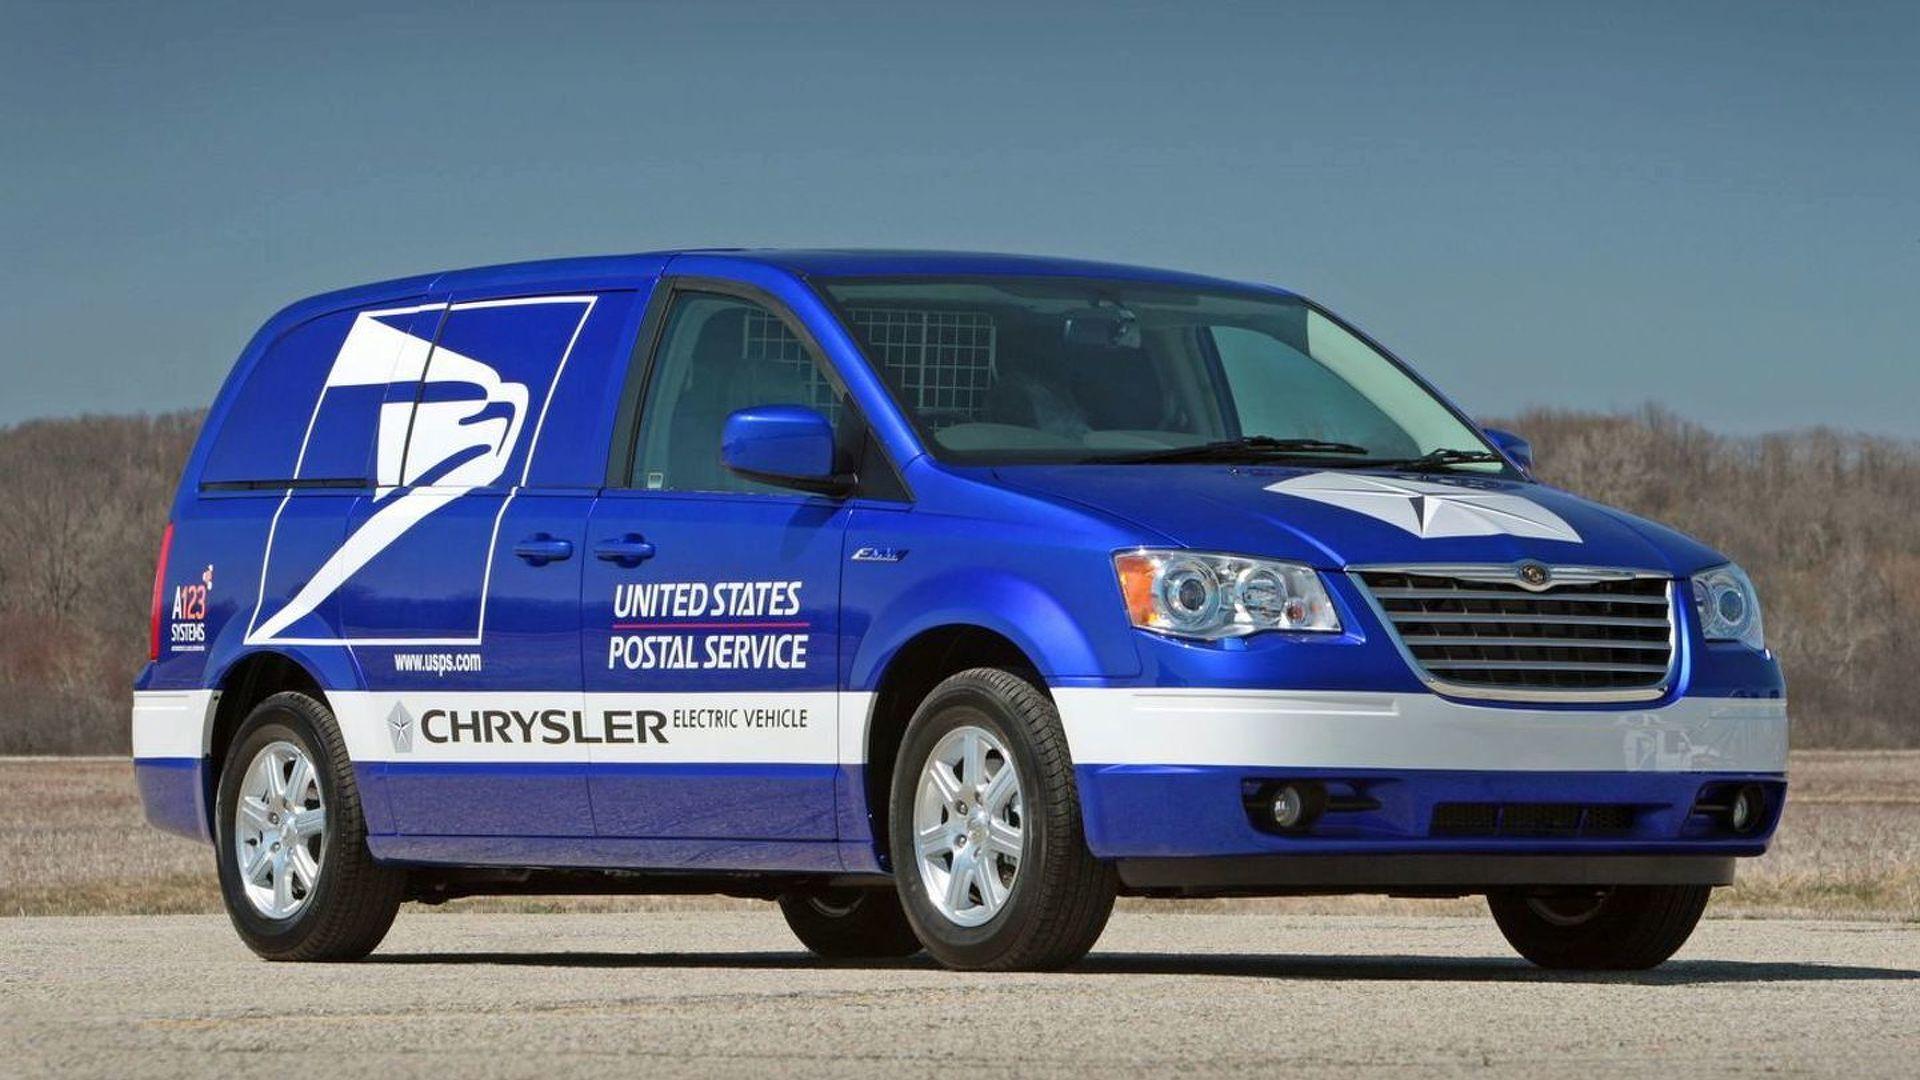 Chrysler Reveals Minivan EV Proposal for US Post Office - Seeks more gov funding